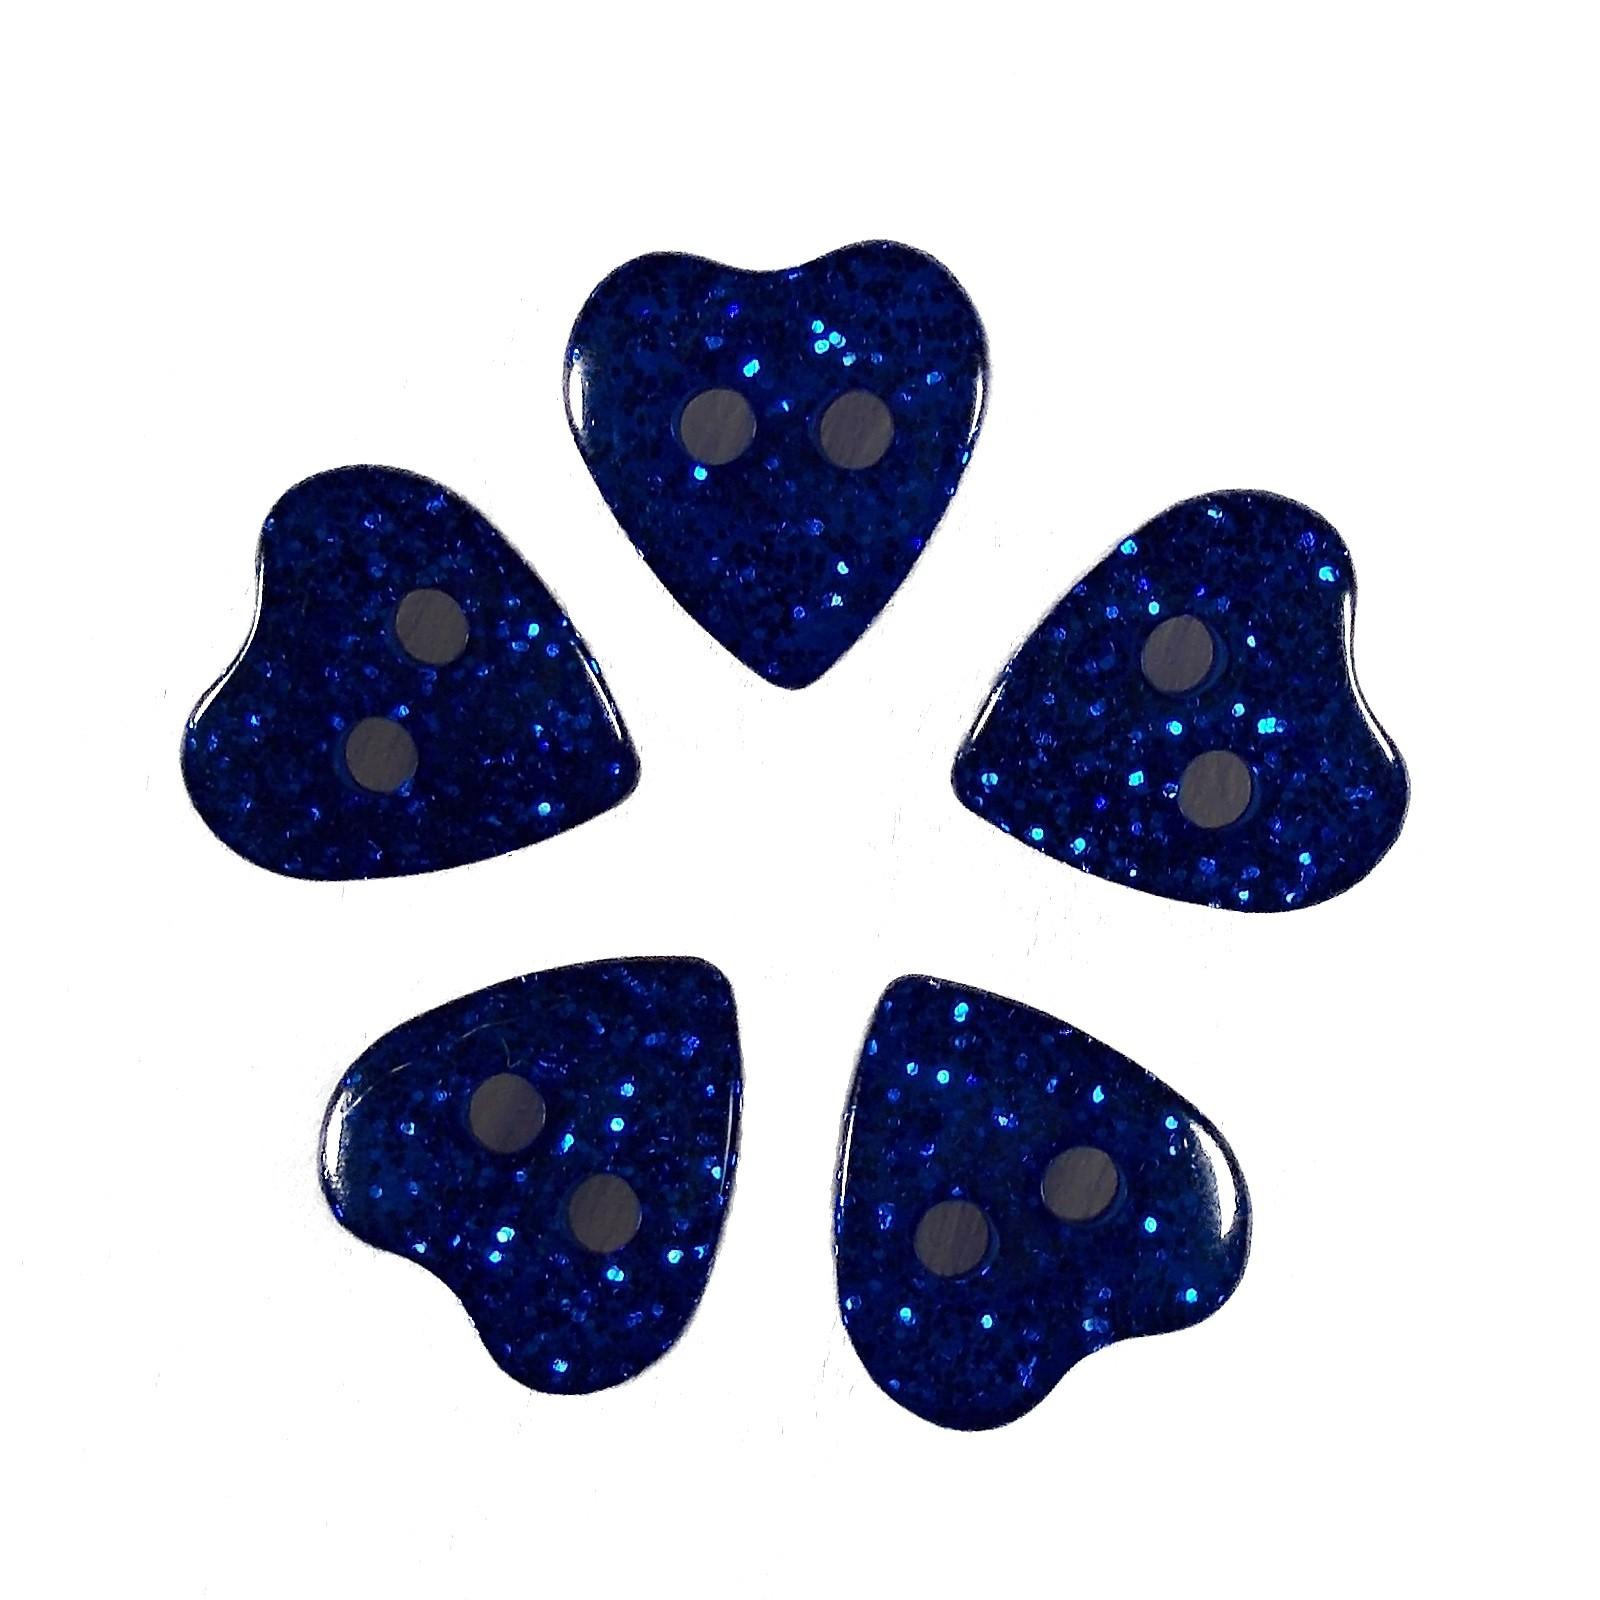 Colour Glitter Heart Shape Buttons 9mm Blue Pack of 5